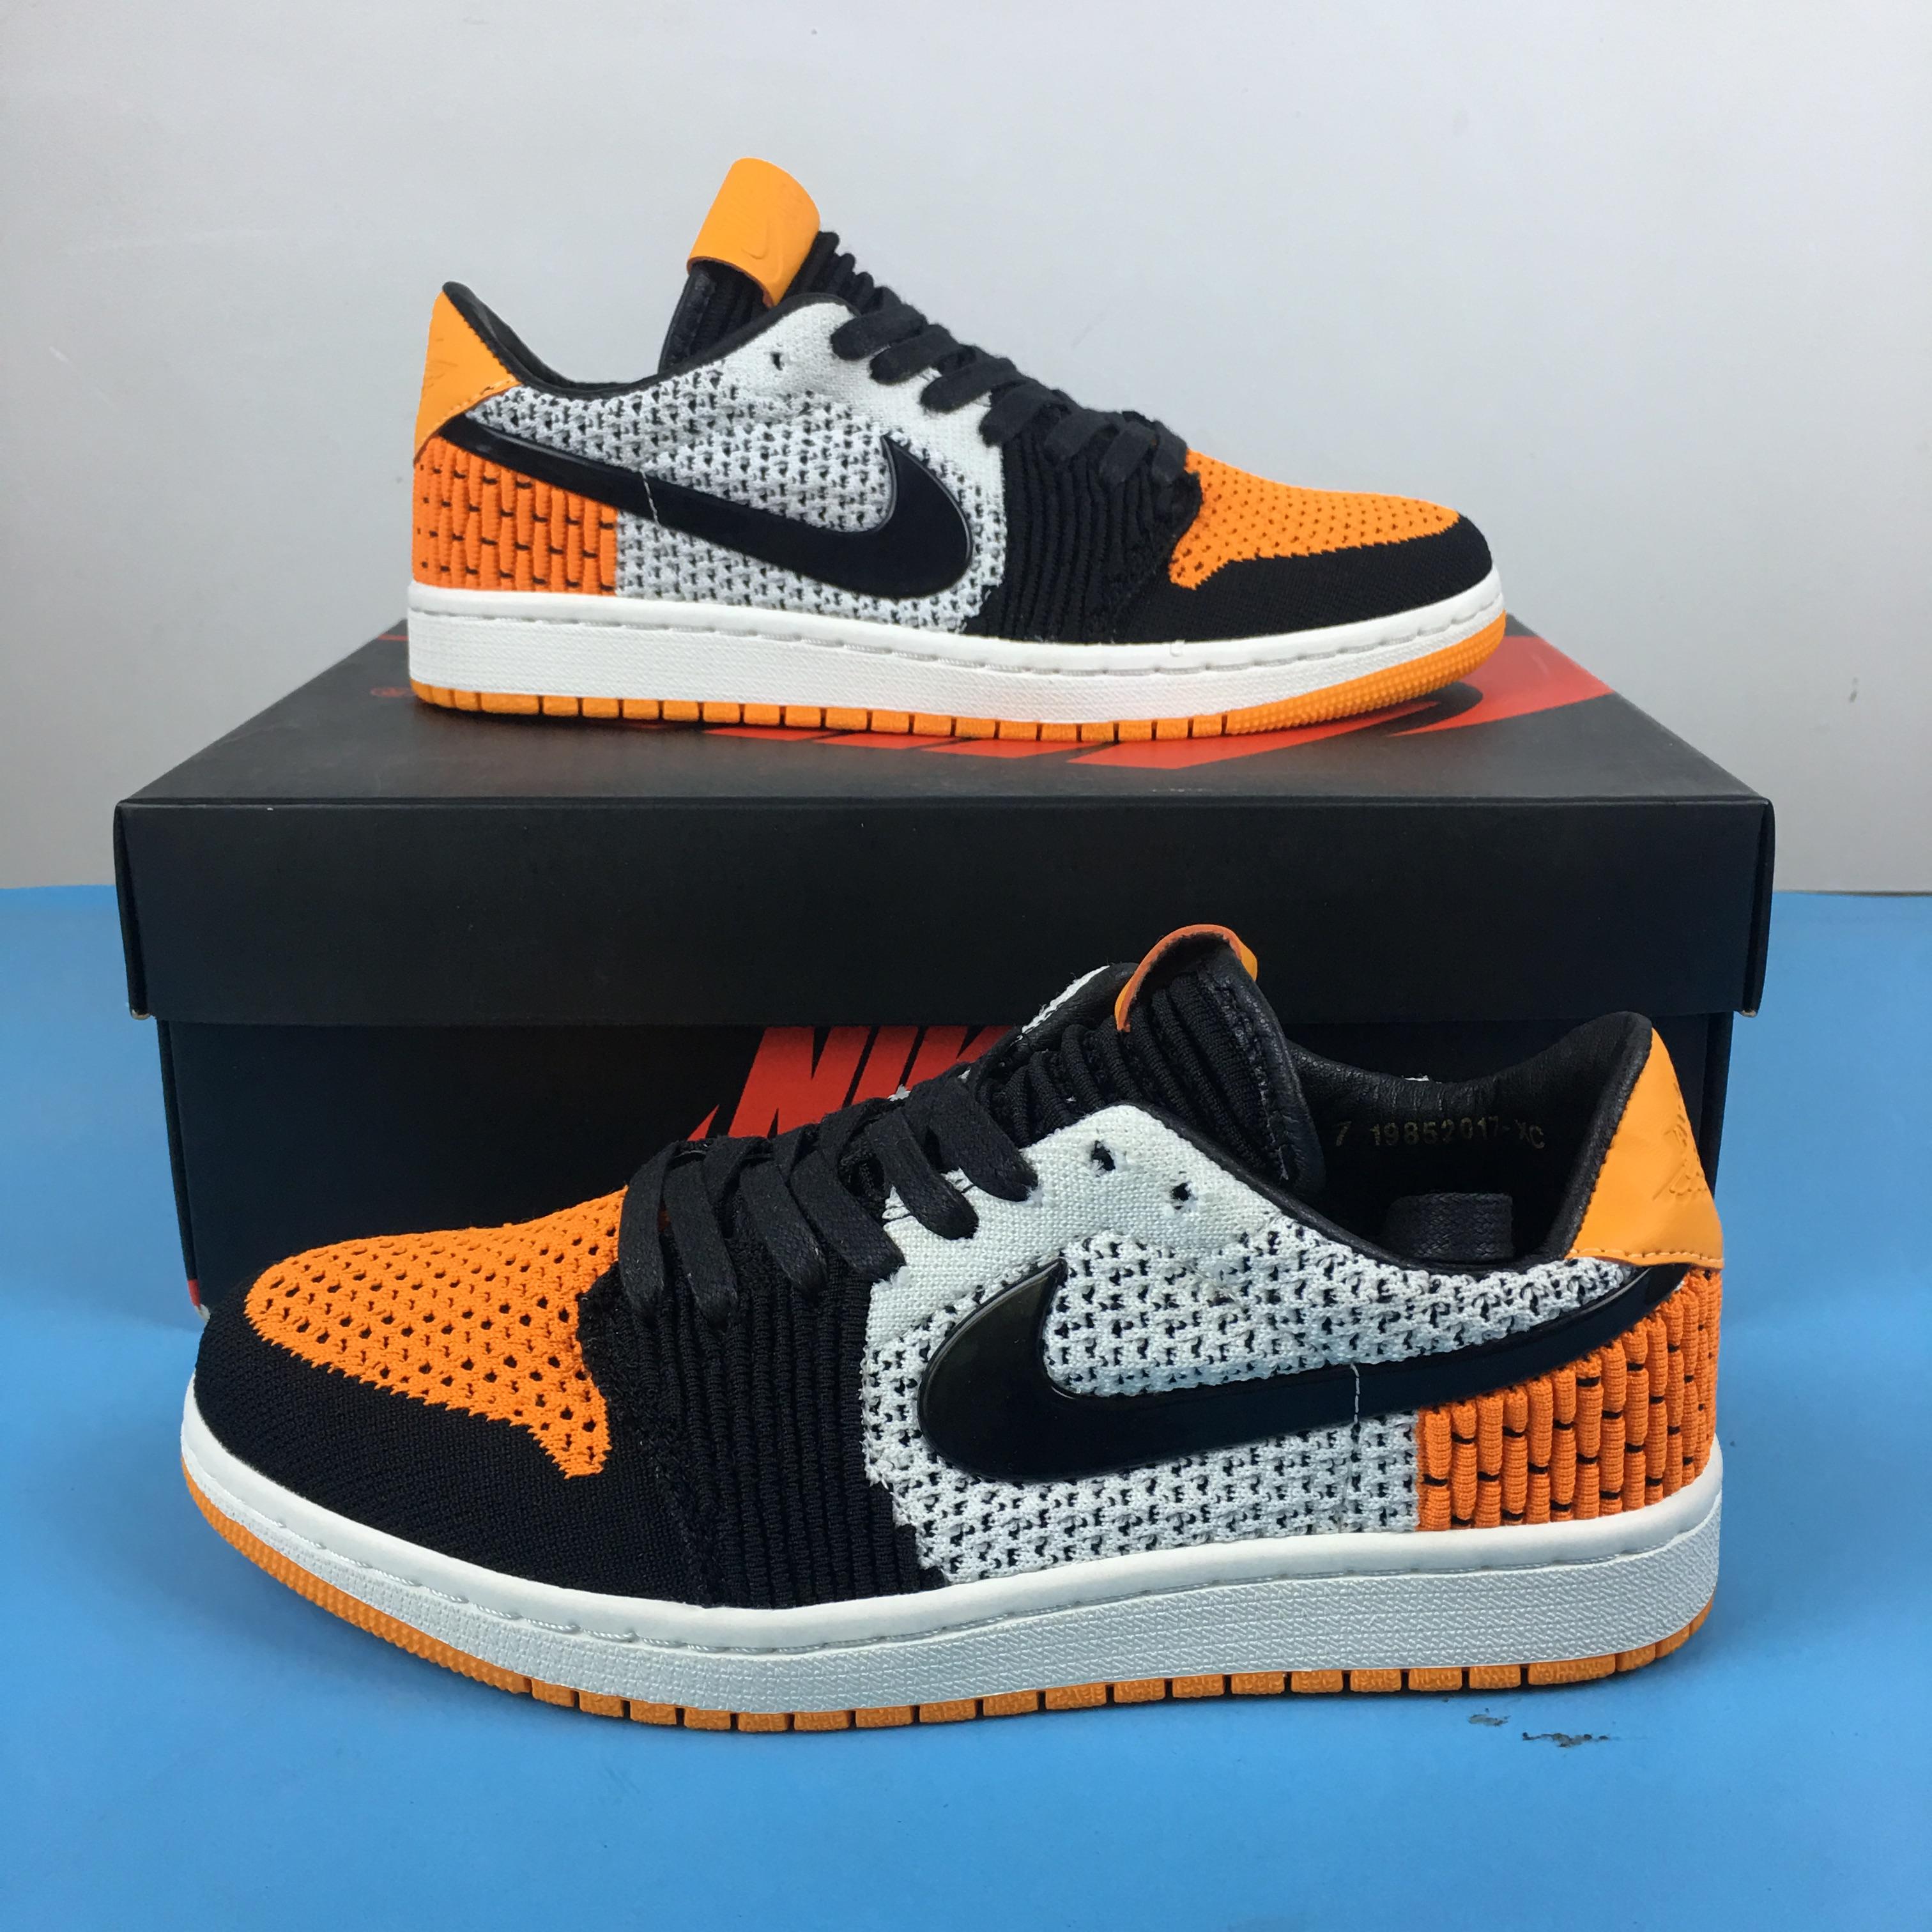 58729d5a29c83 2018 Men Air Jordan 1 Low Flyknit Orange Black White Shoes ...